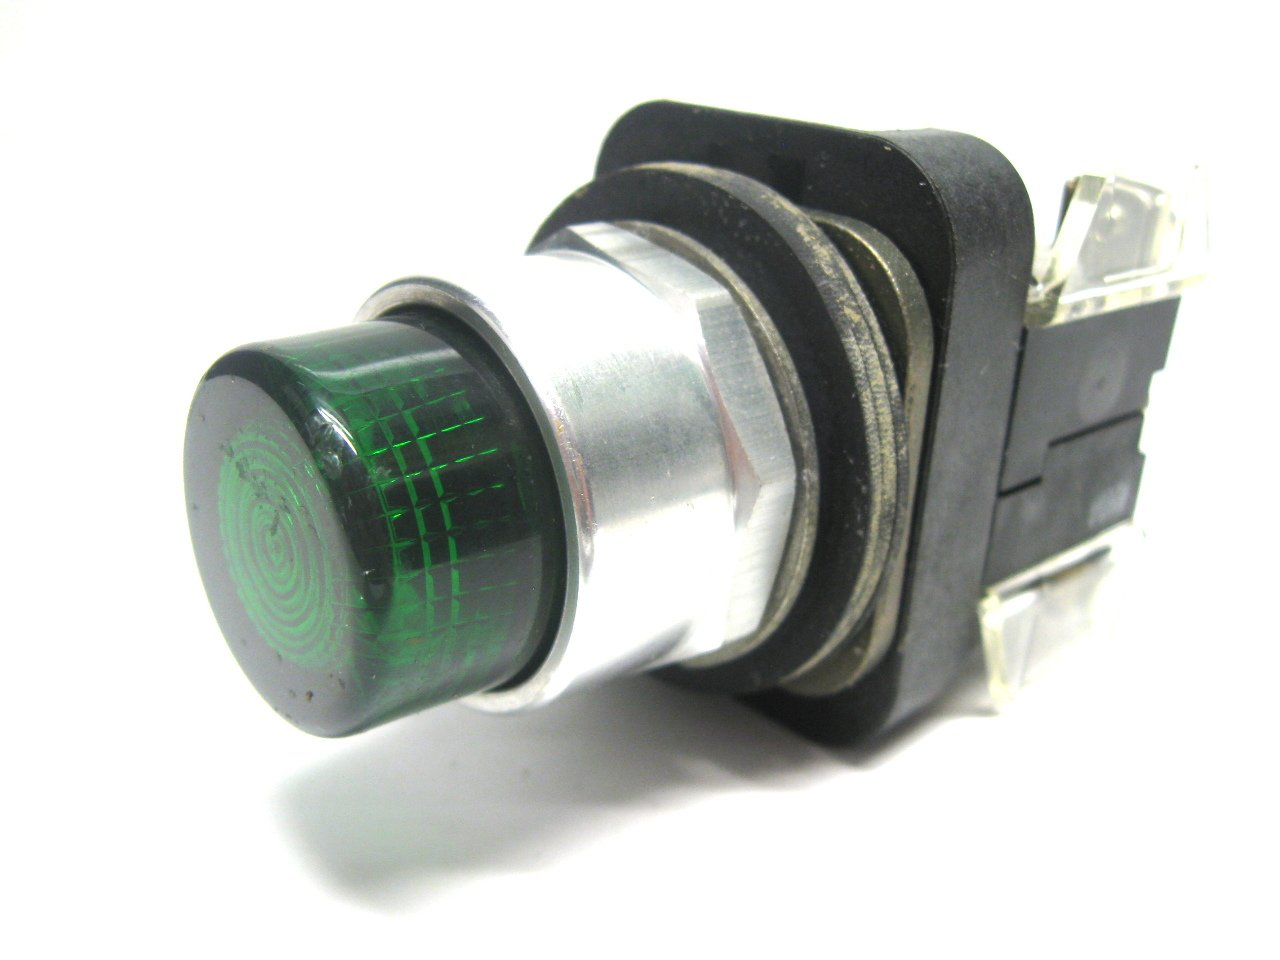 Allen Bradley 800T-Qb24 Series T 30 5Mm Momentary Contact Push-Button  800T-Qb24 Series T